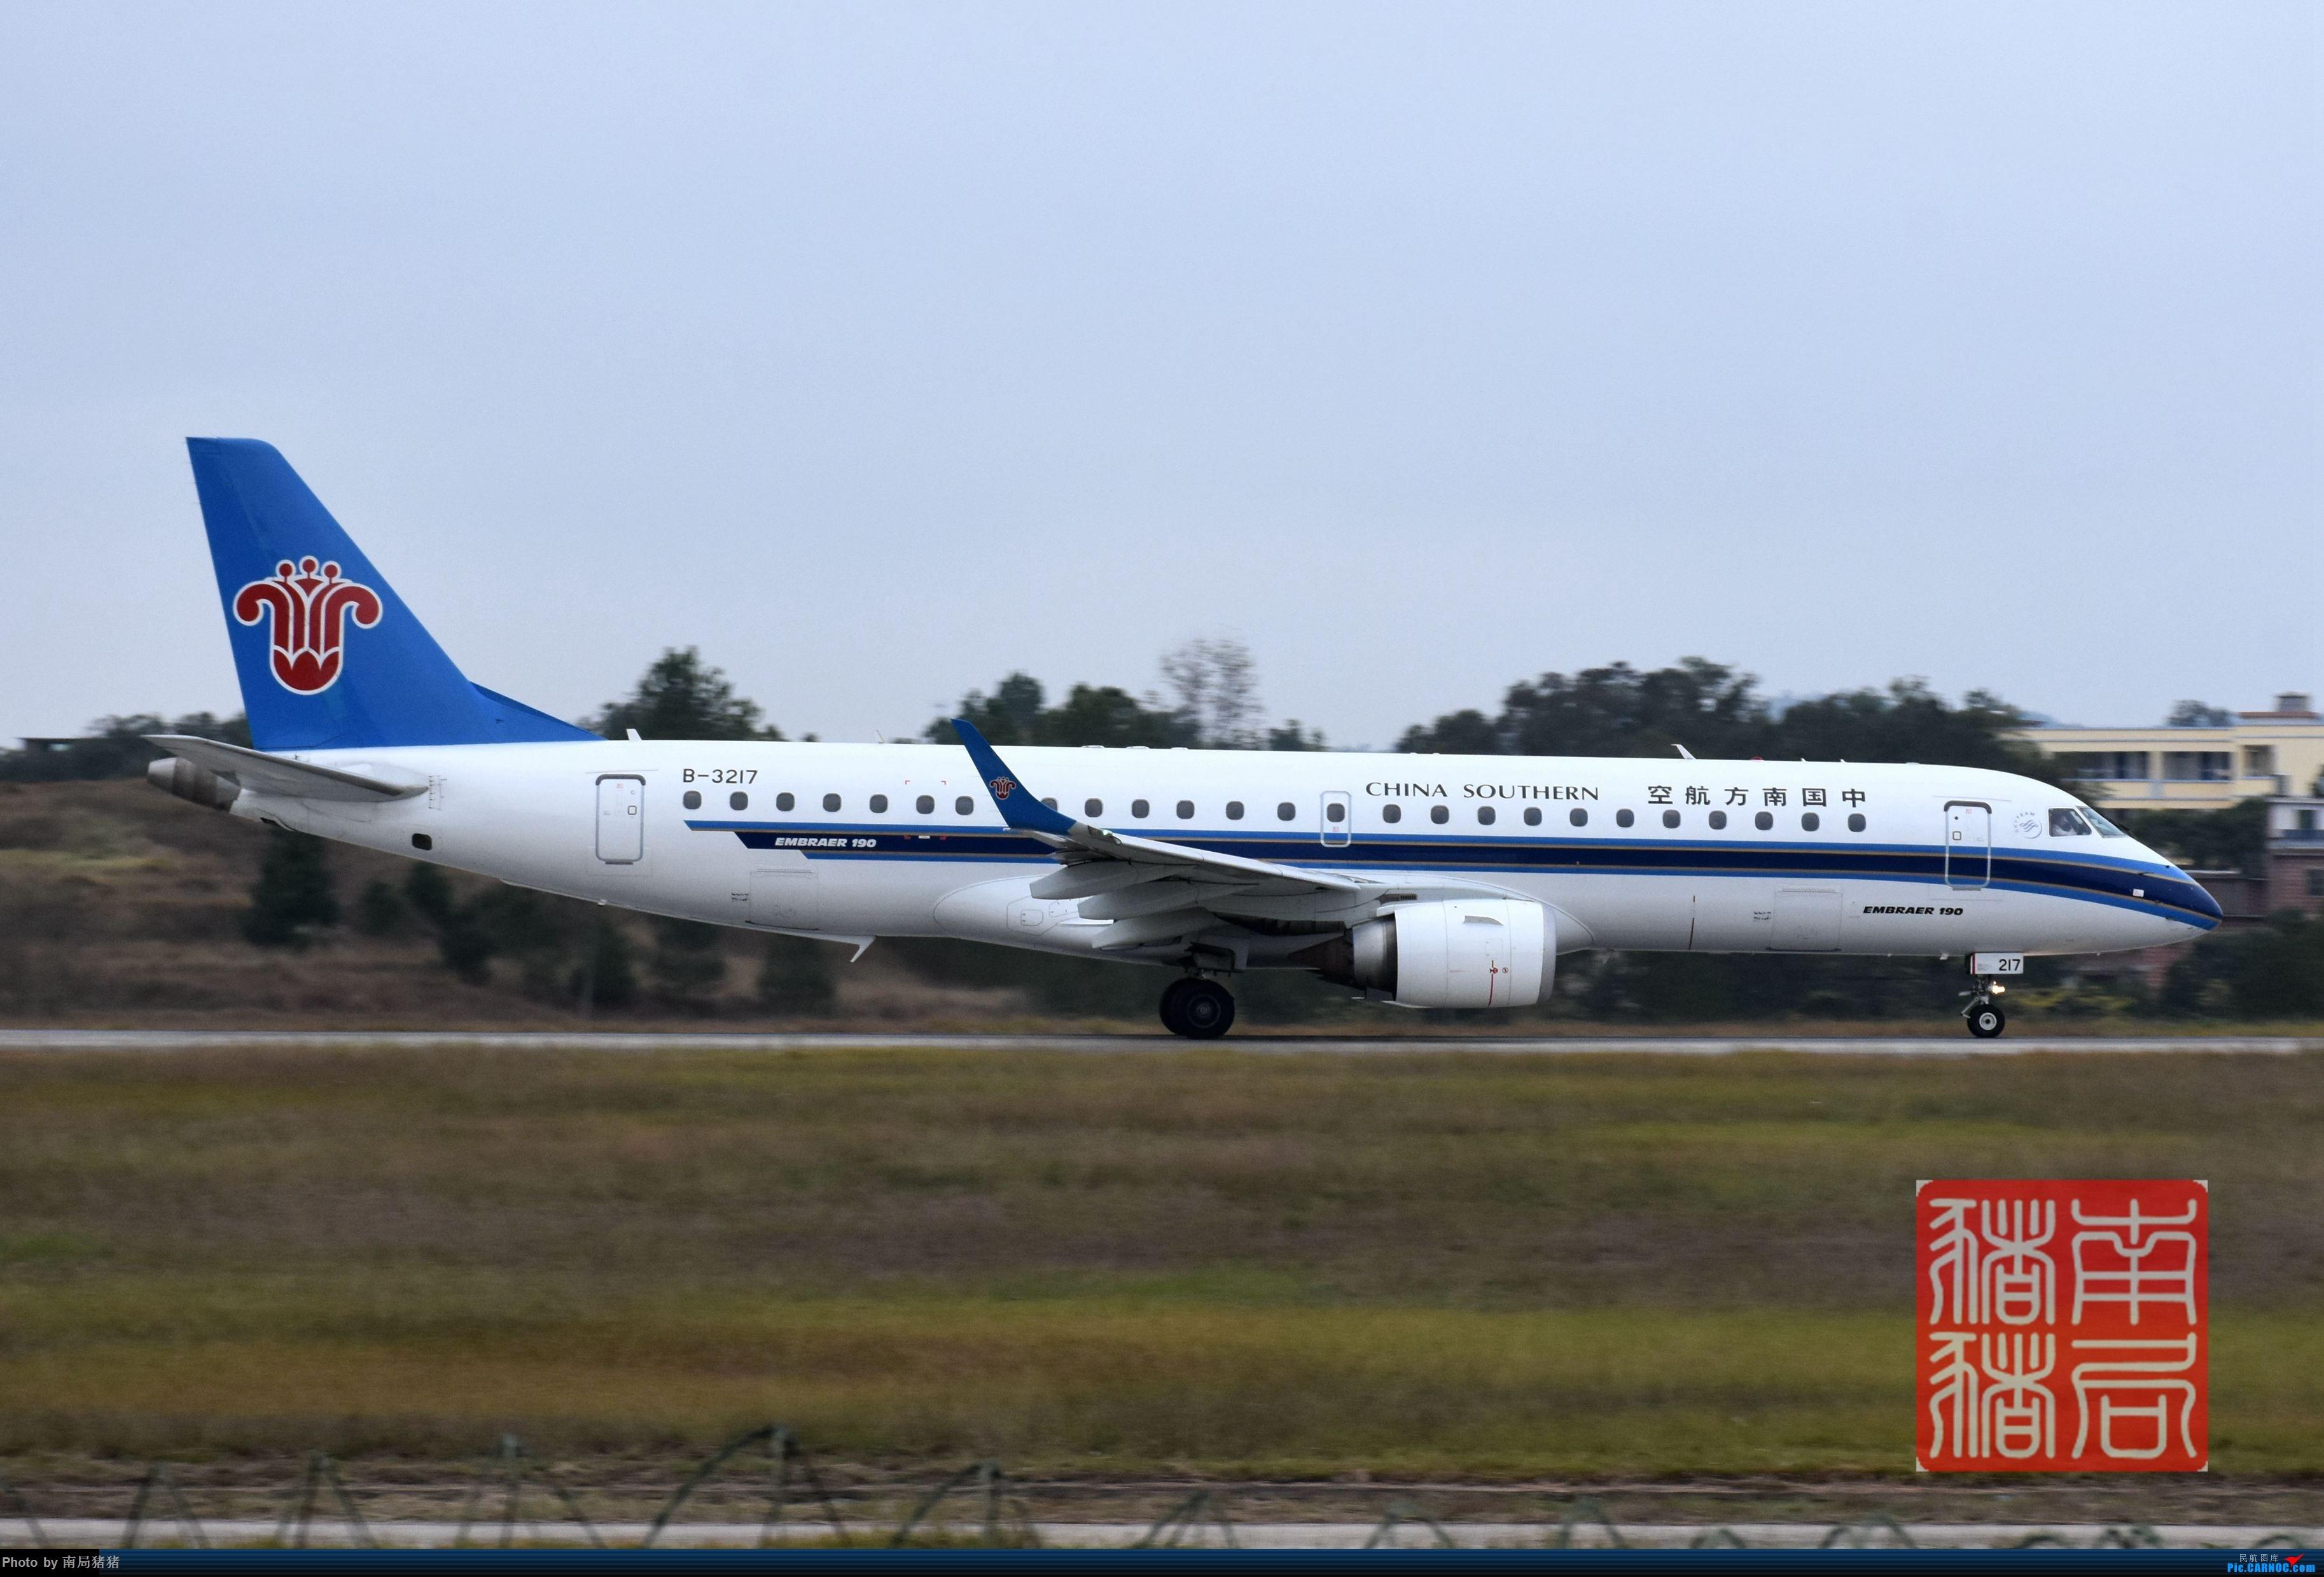 Re:[原创]KOW赣州黄金机场(通航运12,北部湾变形金刚) EMBRAER E-190 B-3217 中国赣州黄金机场